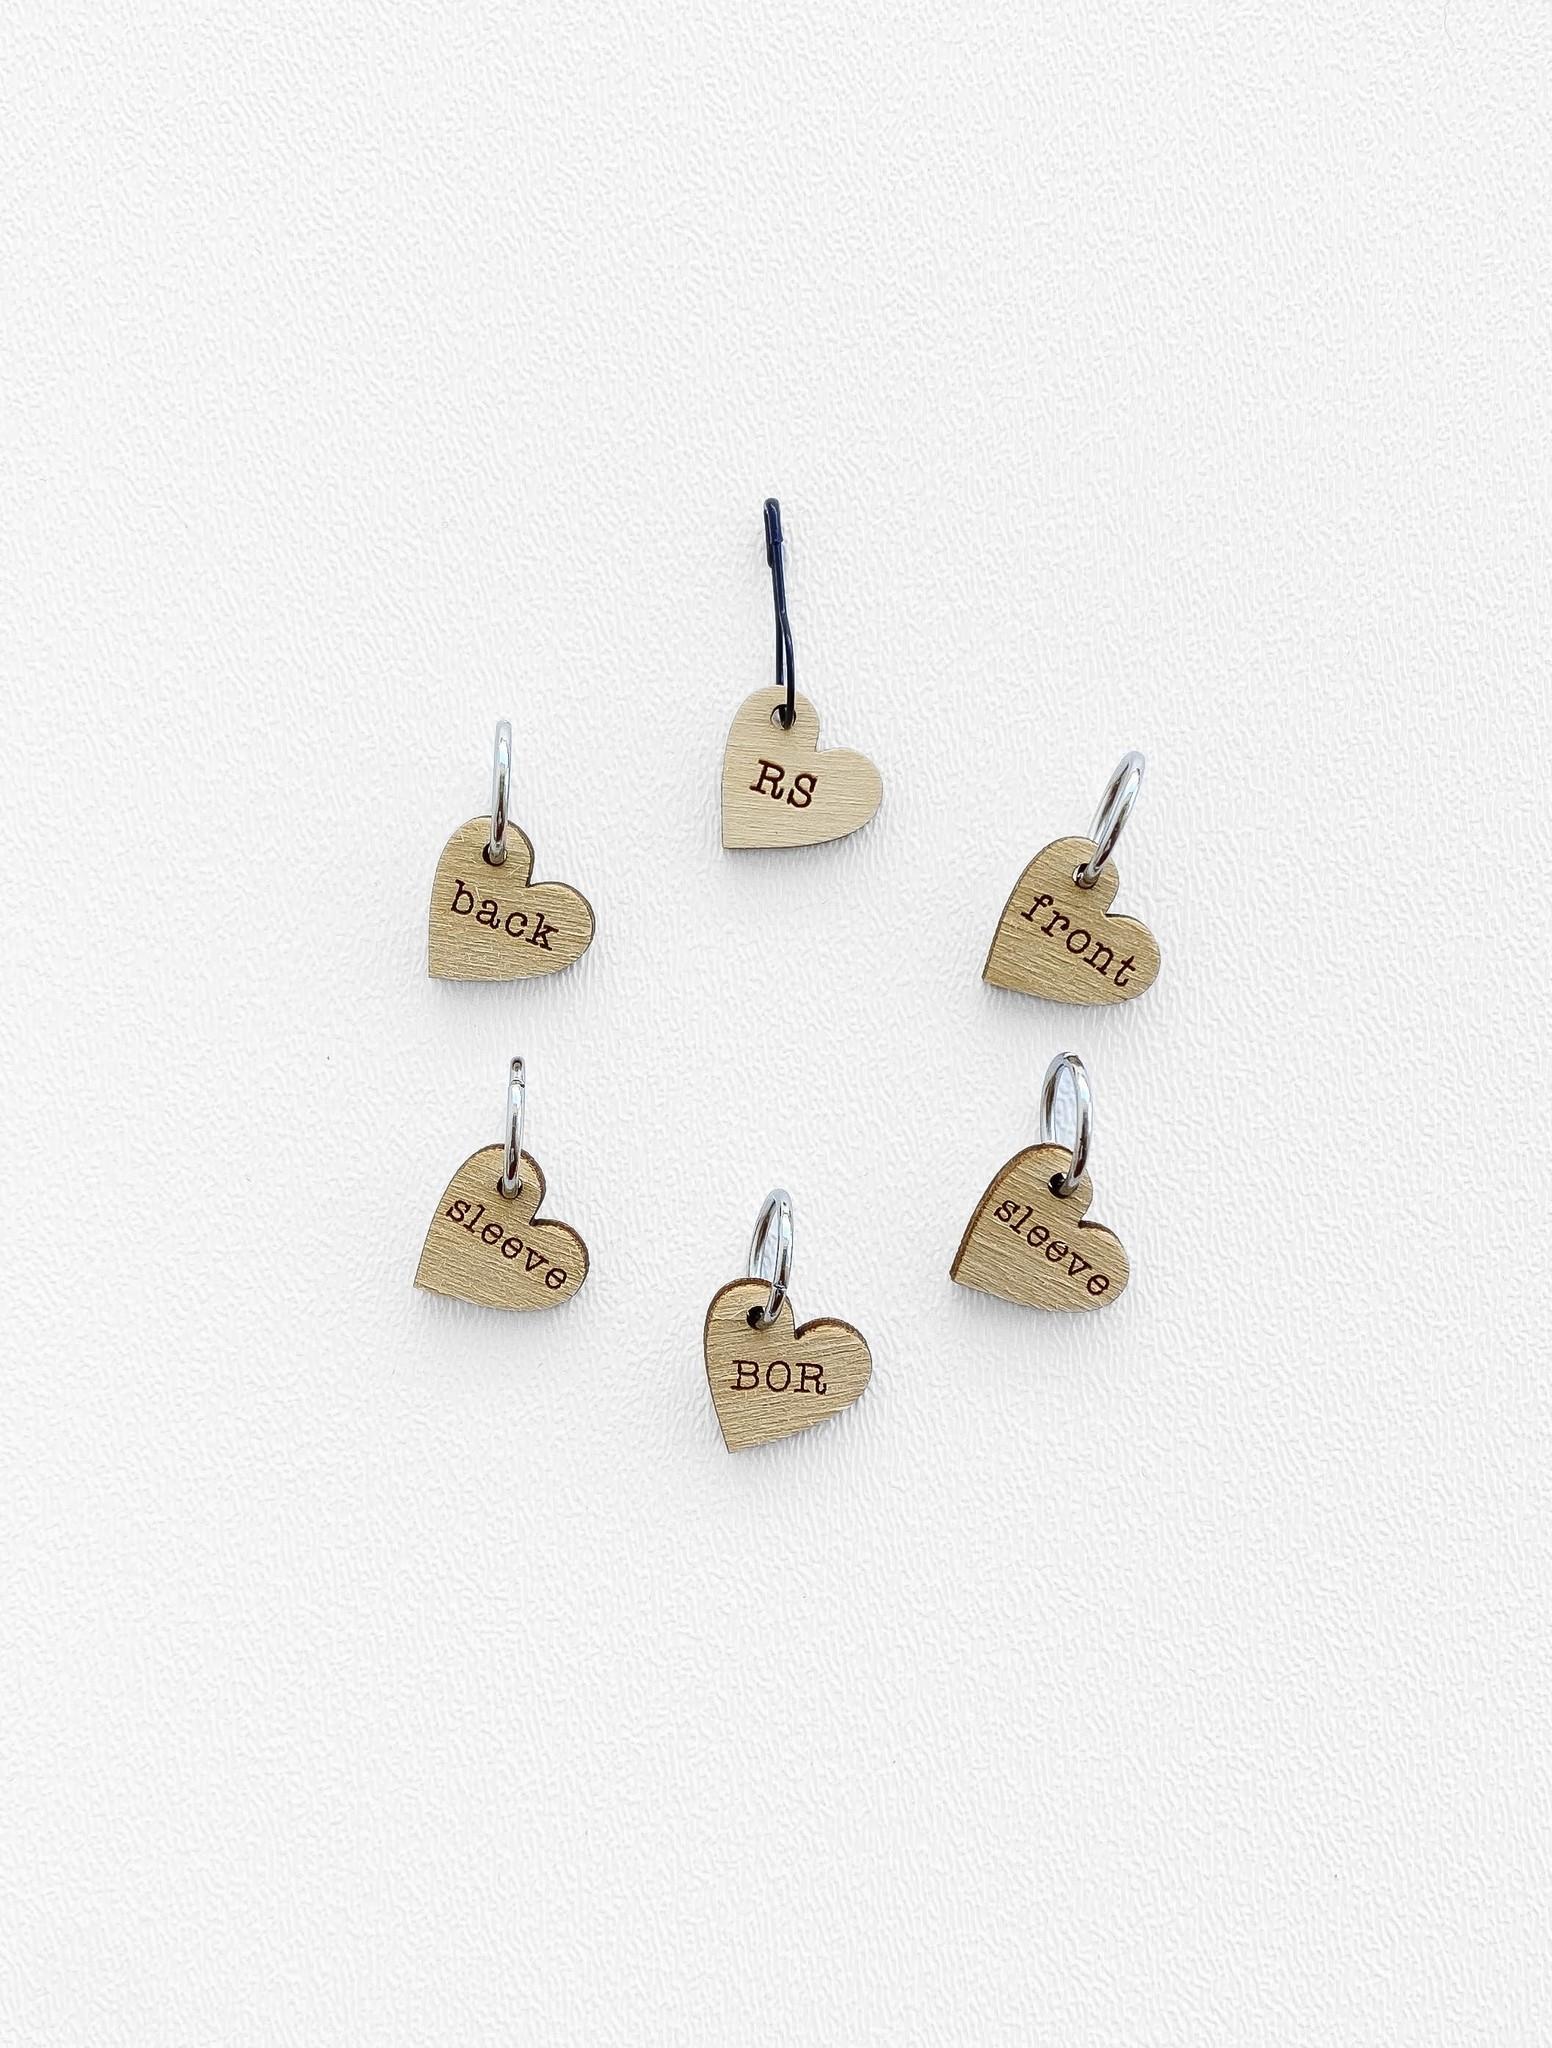 Katrinkles Instruction Stitch Marker Set - Card of 6 Pins